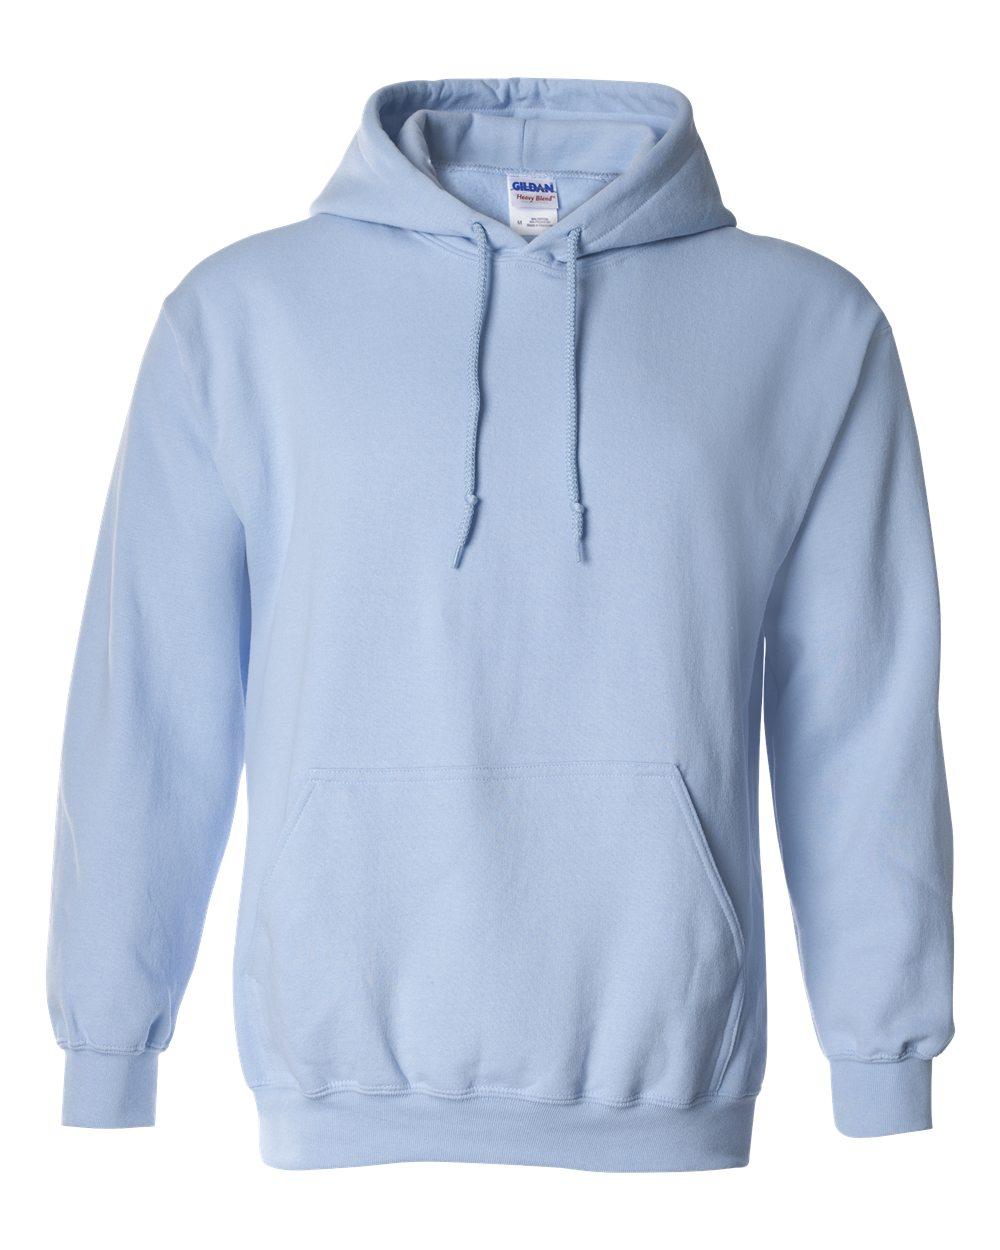 Light Blue Gildan Hoodie